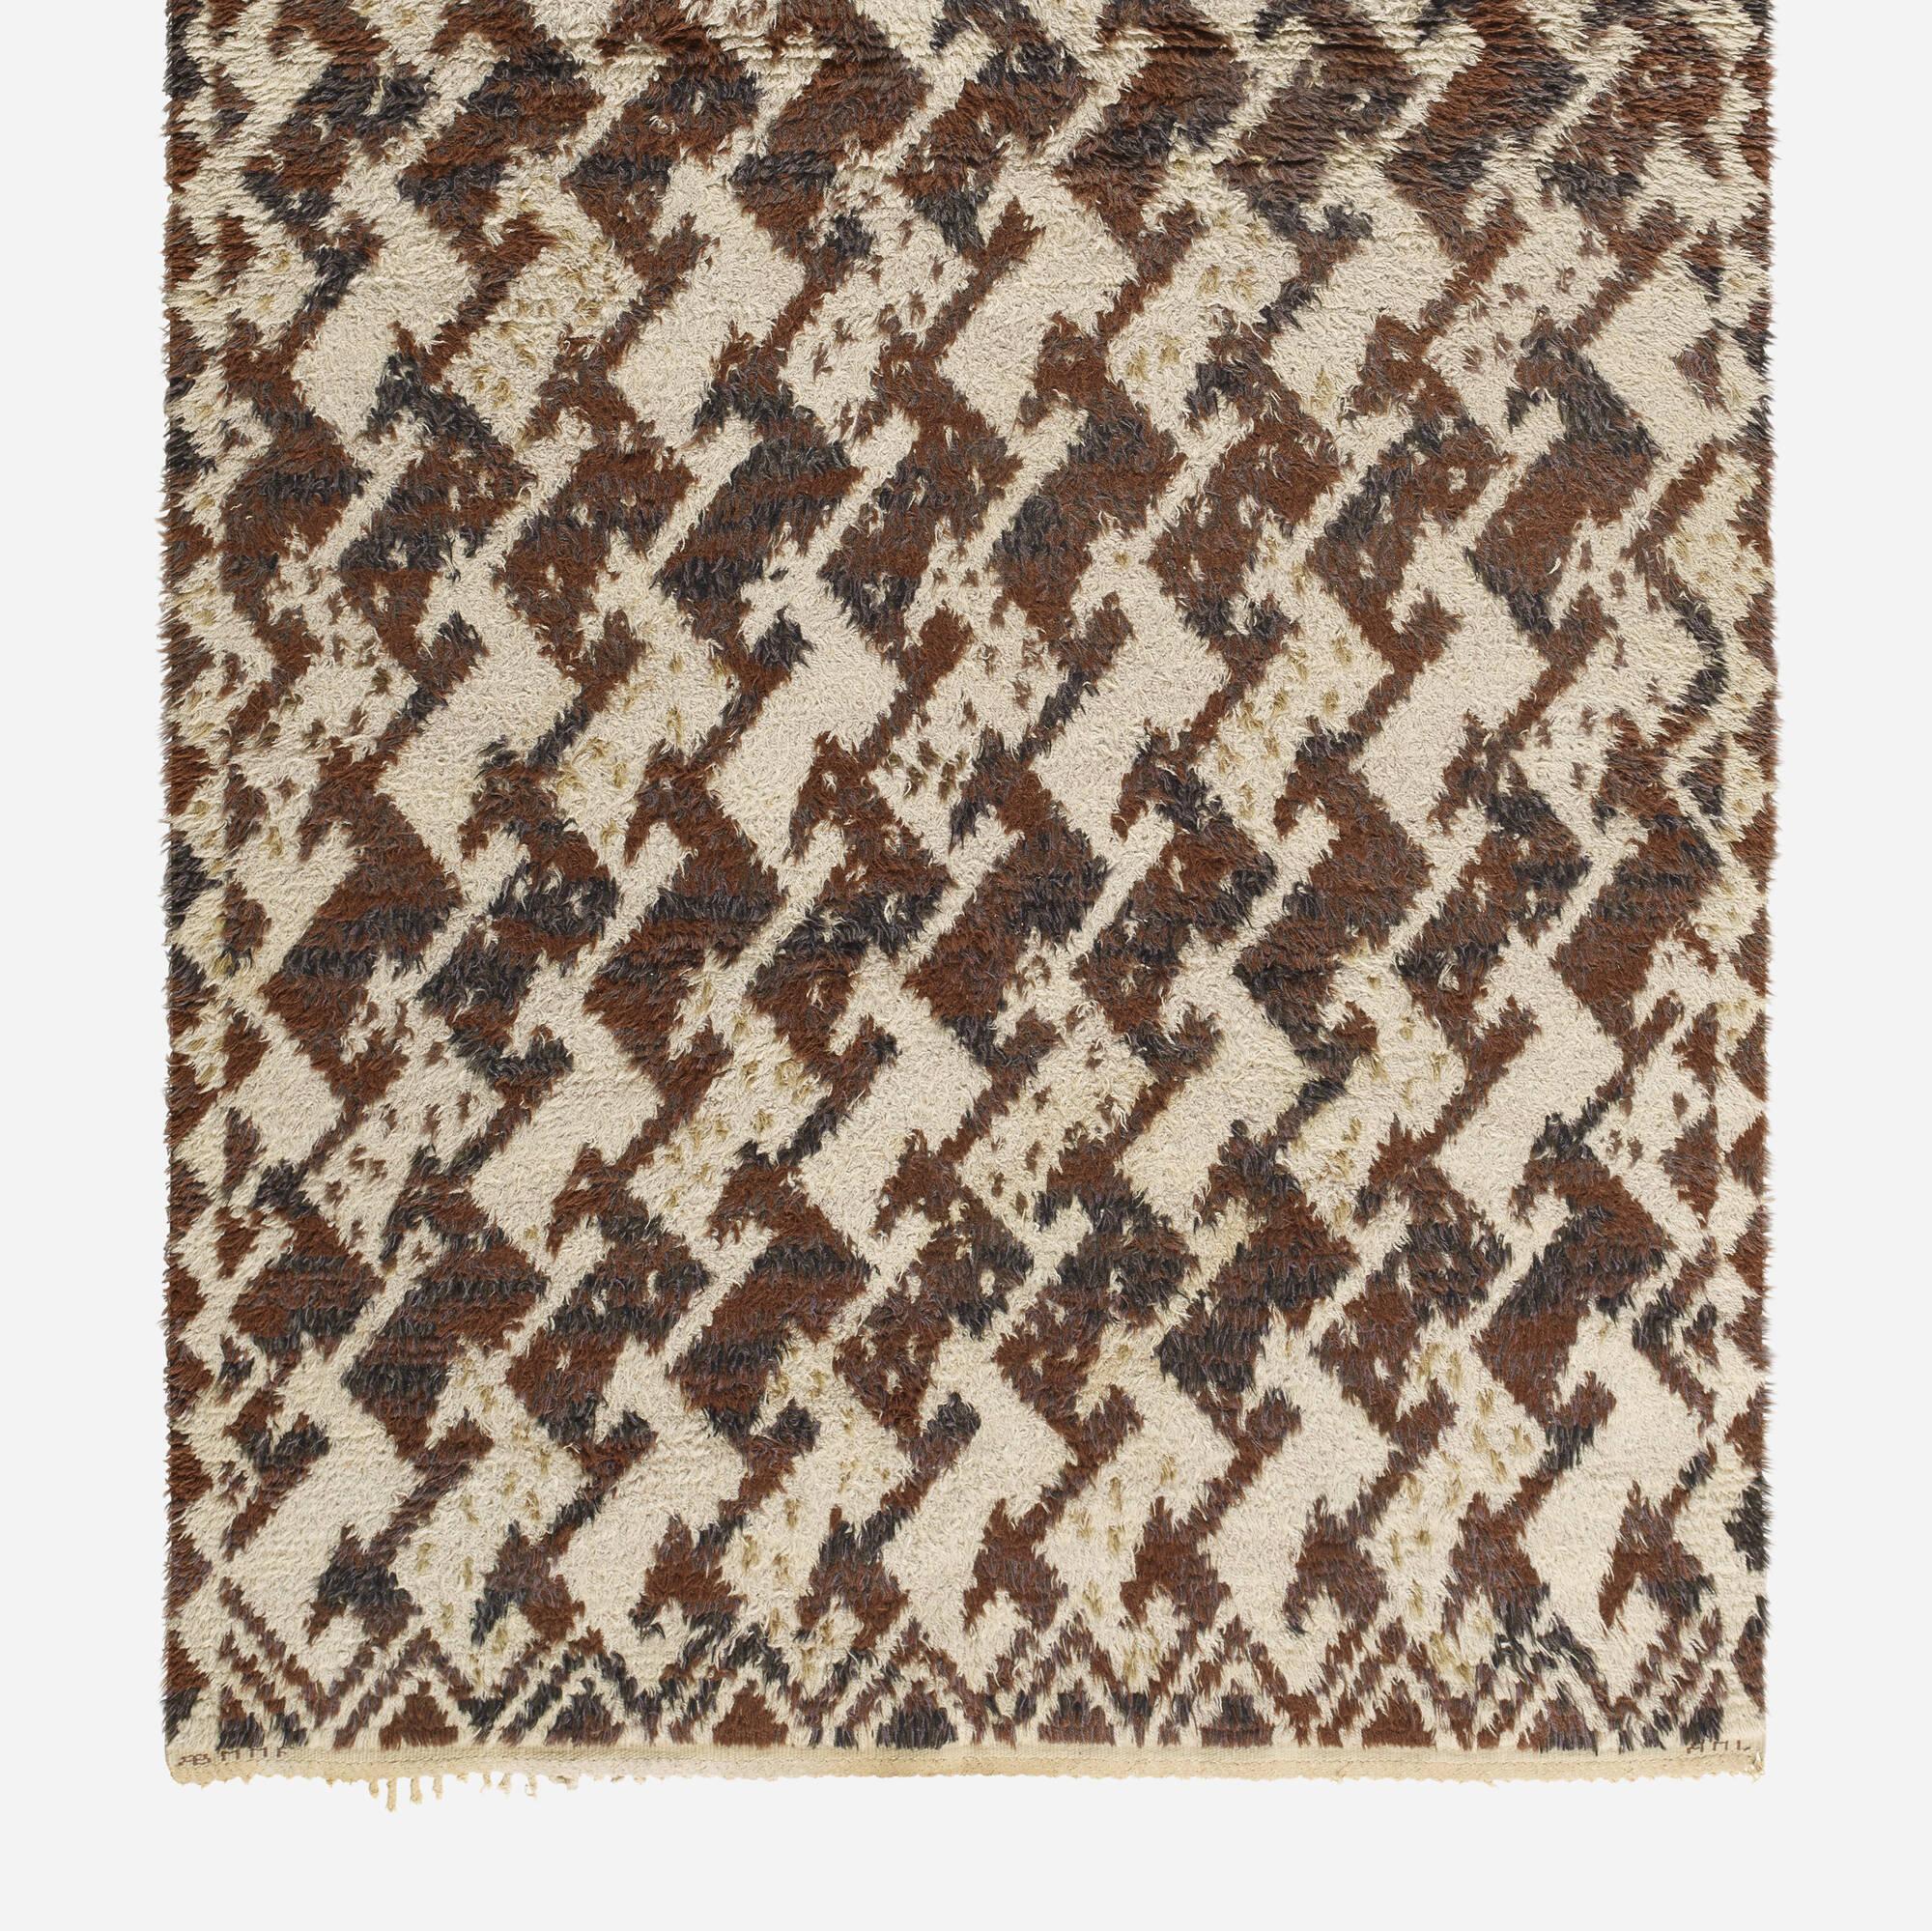 193: Ann-Mari Forsberg / Kråkan rya carpet (2 of 2)